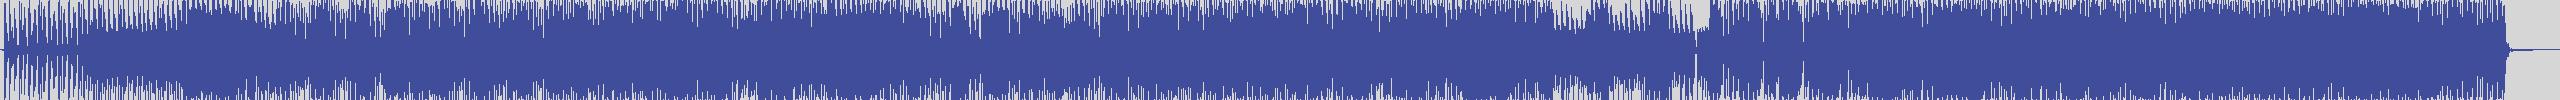 smilax_dig_records [Smilax_X448DIG] Dj Silver, Mary - Estate Bellissima [Original Mix] audio wave form